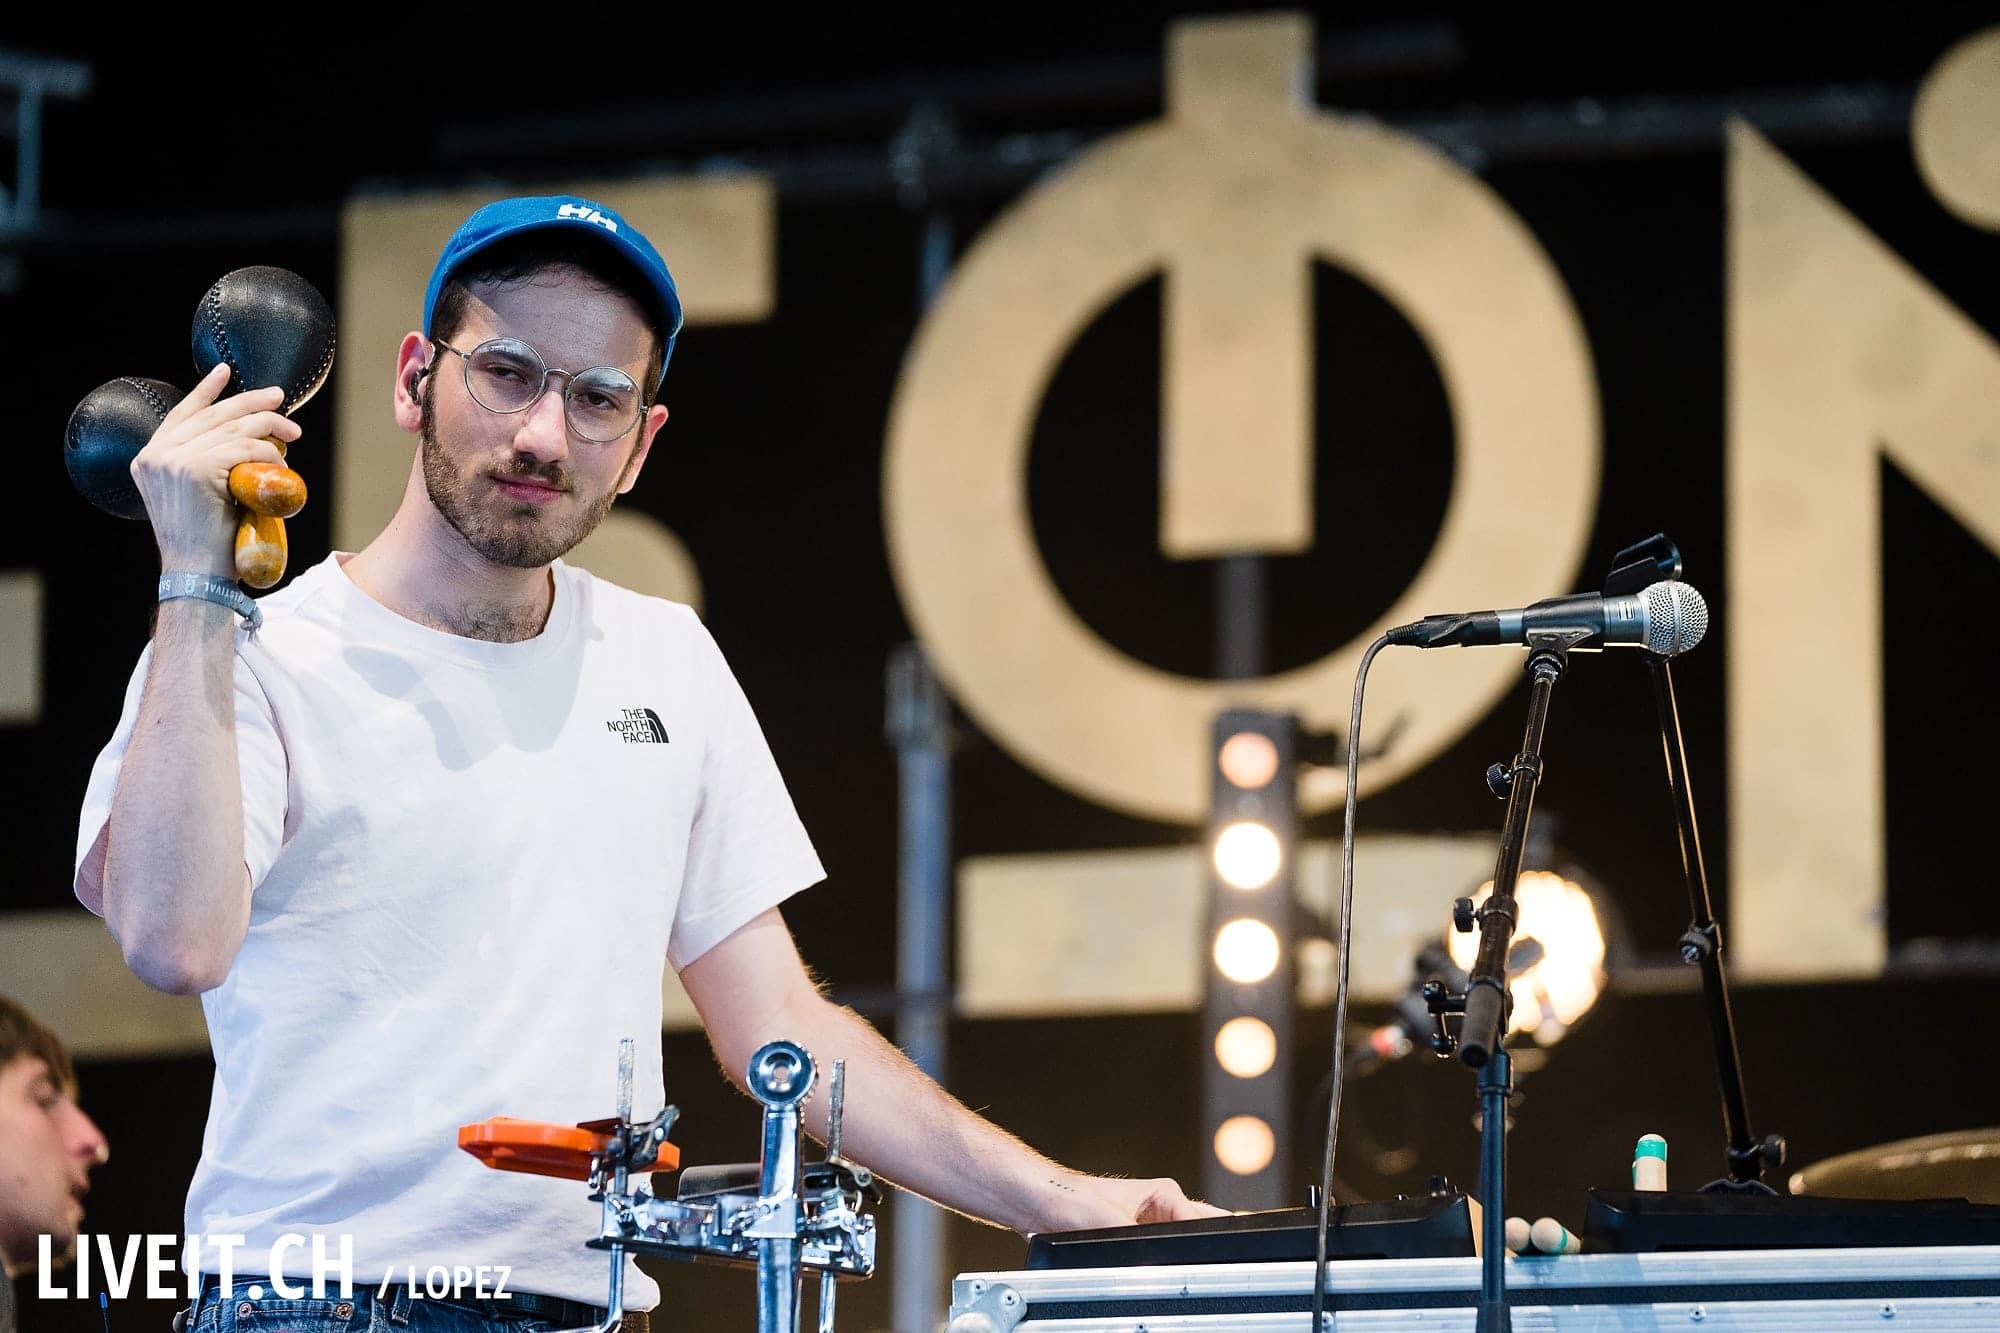 Leoniden fotografiert am Gurtenfestival 2018 in Bern. (Manuel Lopez for Gurtenfestival)